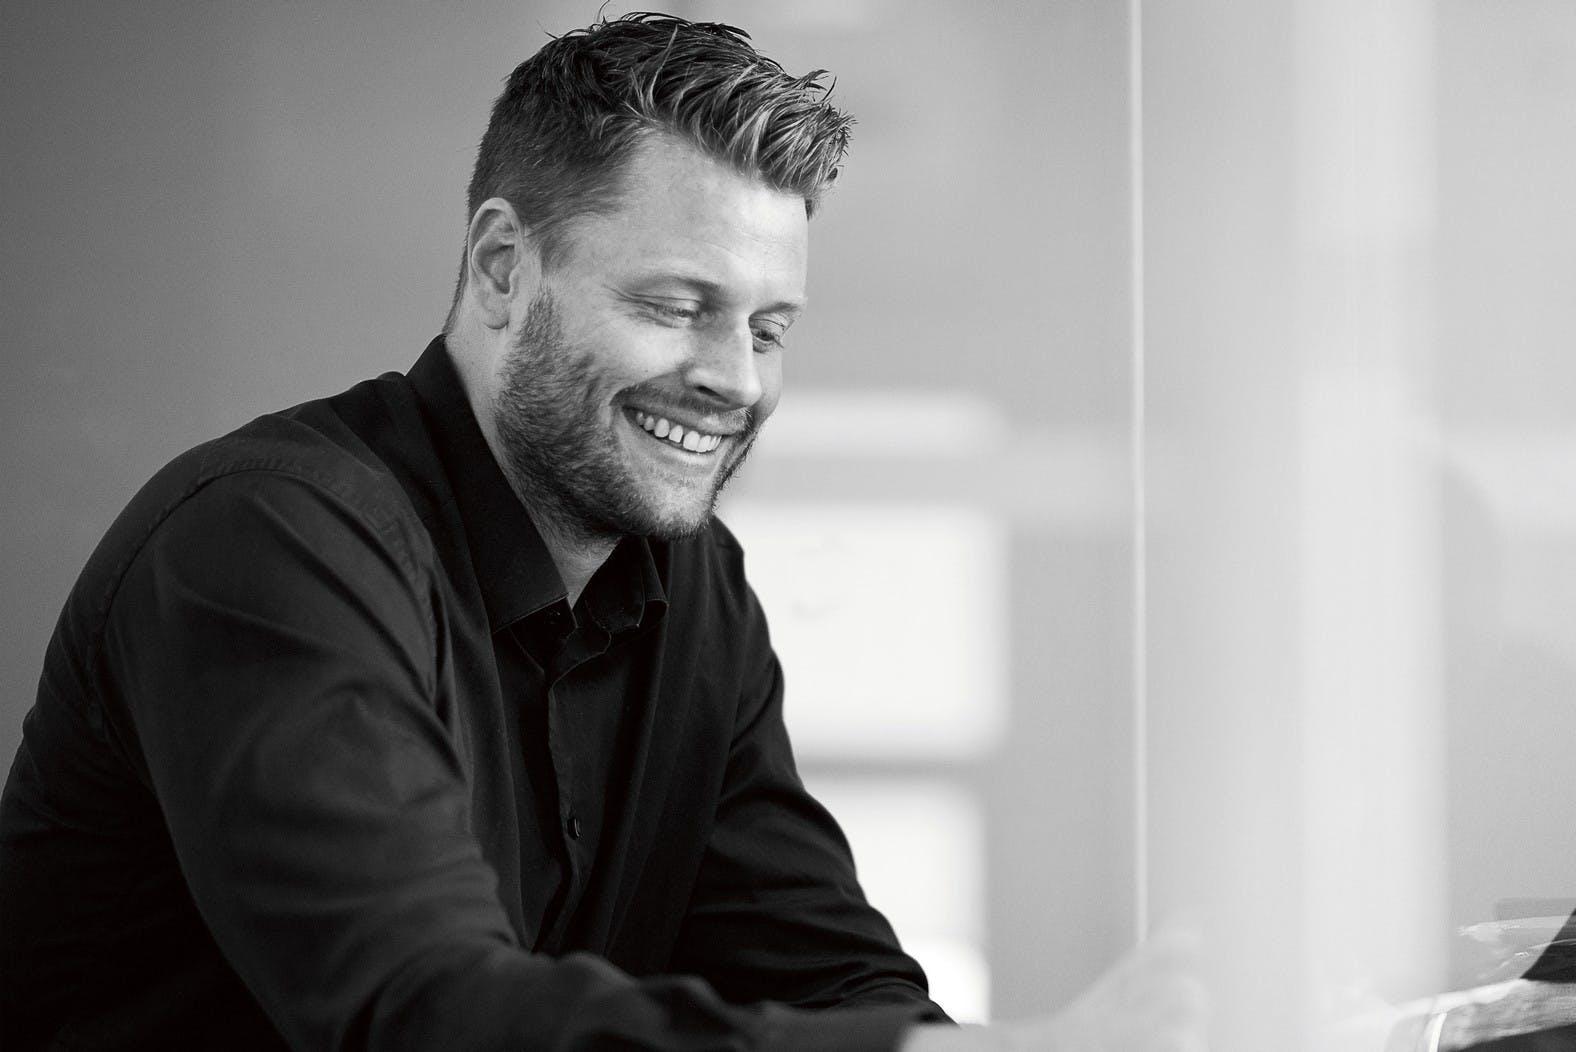 Søren Kjestrup Holm Wissing